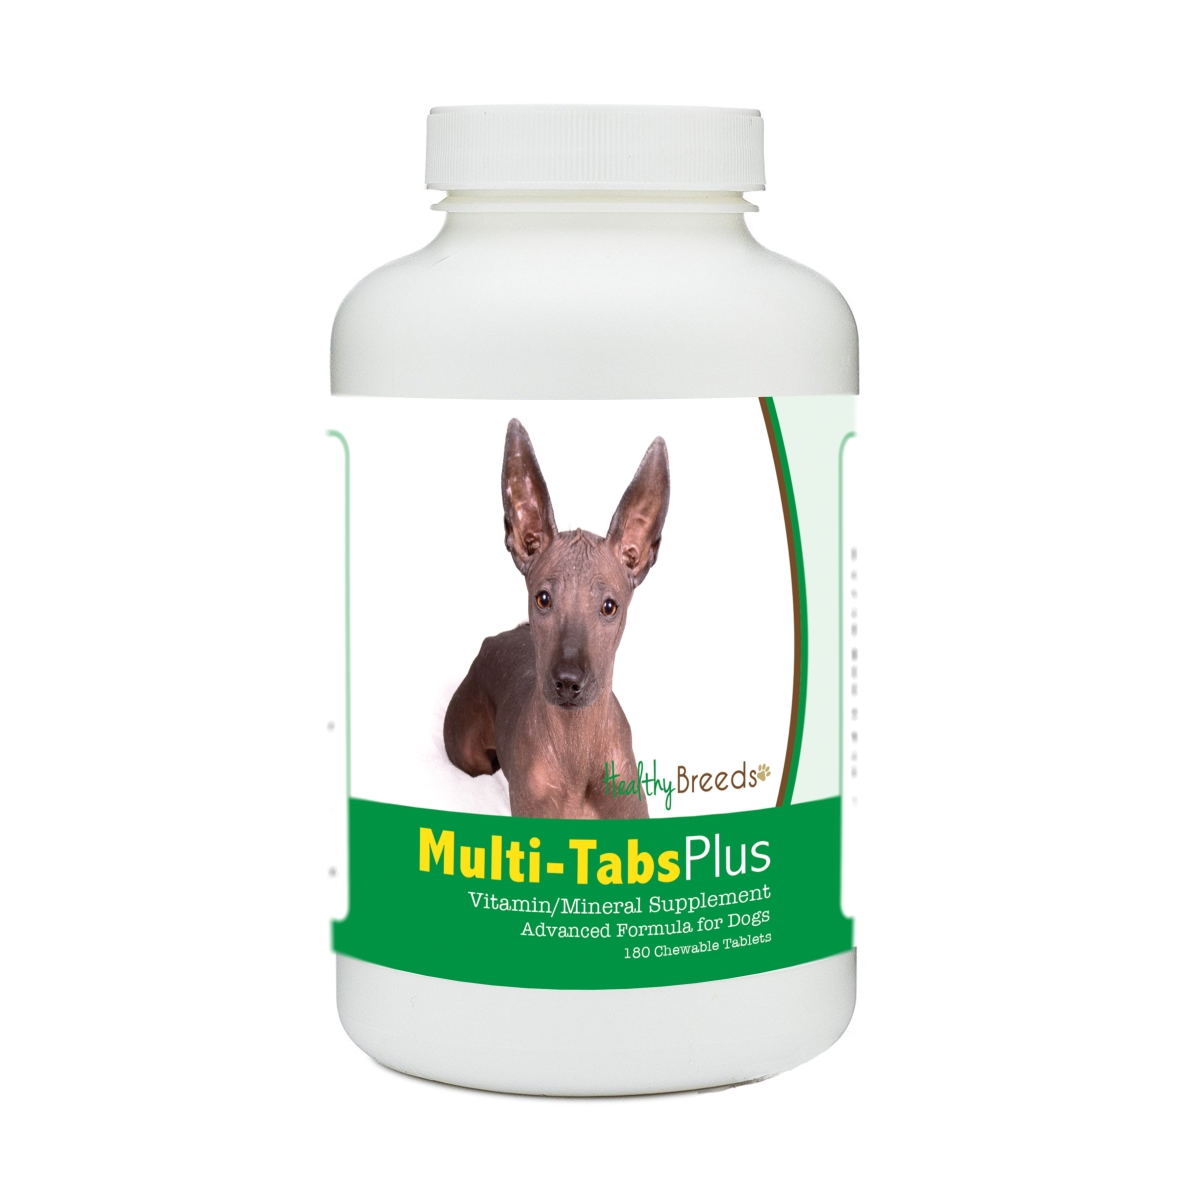 Healthy Breeds 840235178804 Xoloitzcuintli Multi-Tabs Plus Chewable Tablets - 180 Count